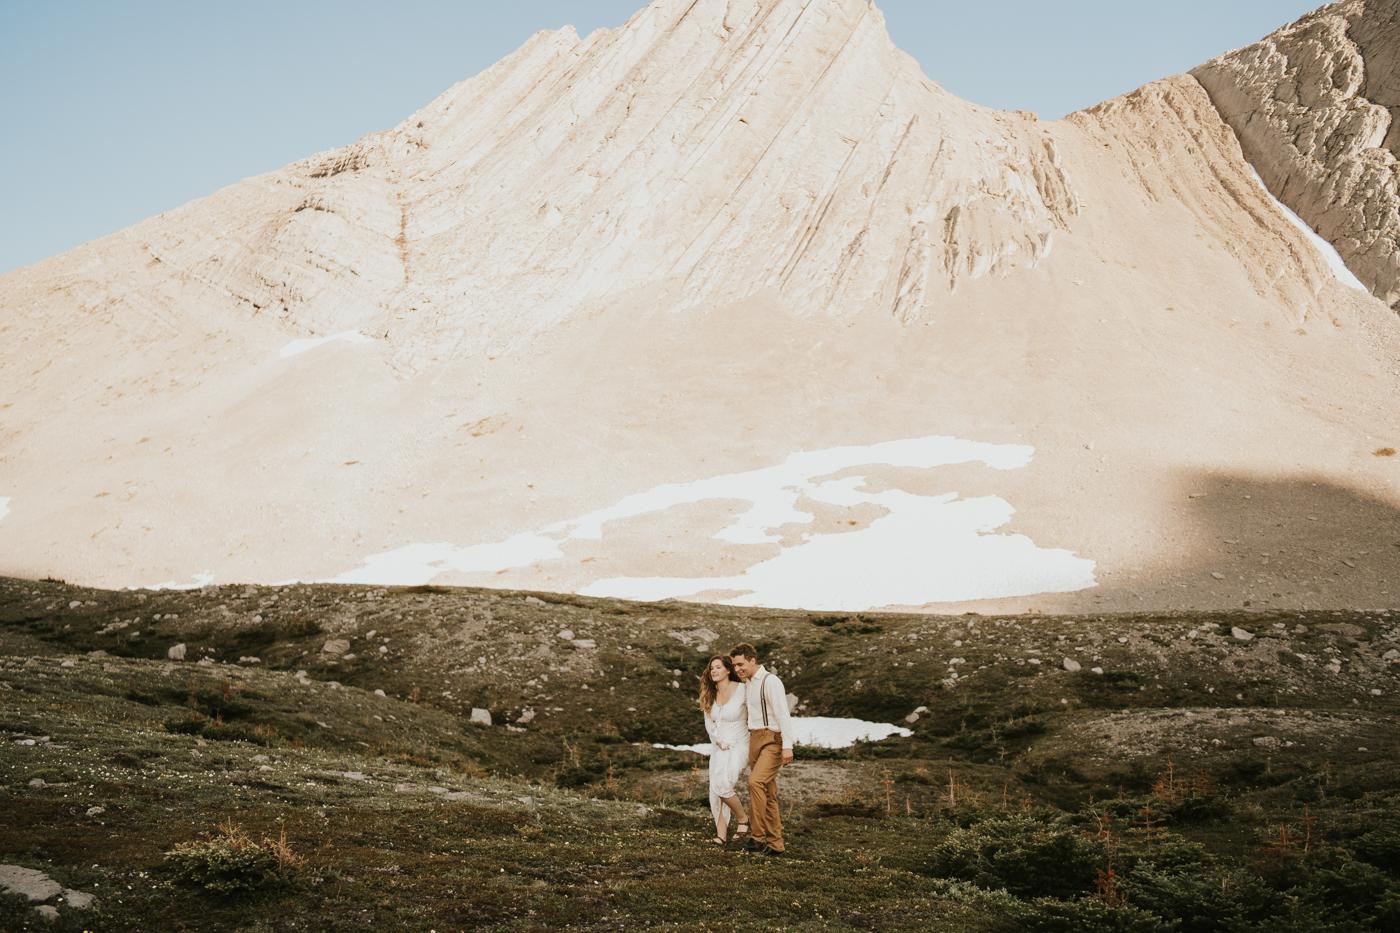 tyraephotography_photographer_wedding_elopement_engagement_photography-08126.jpg